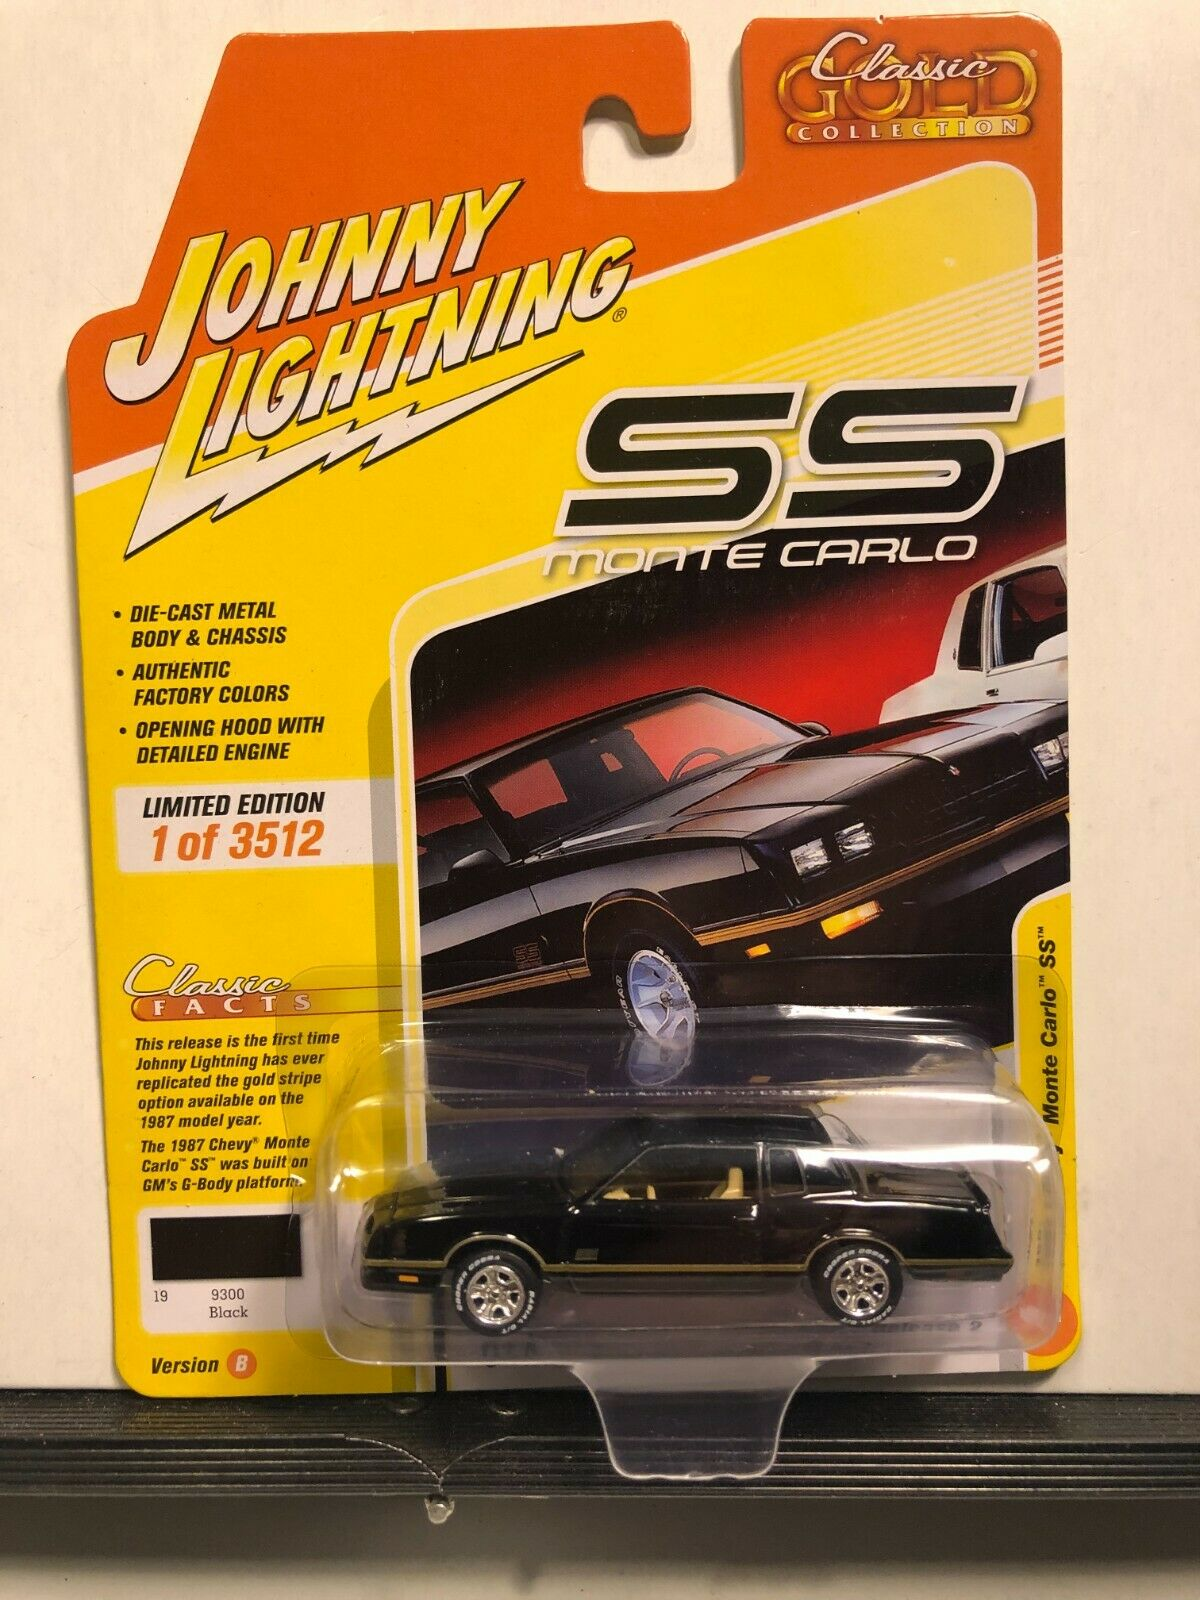 JOHNNY LIGHTNING 2020 2B CLASSIC GOLD BLACK 1987 CHEVY MONTE CARLO SS